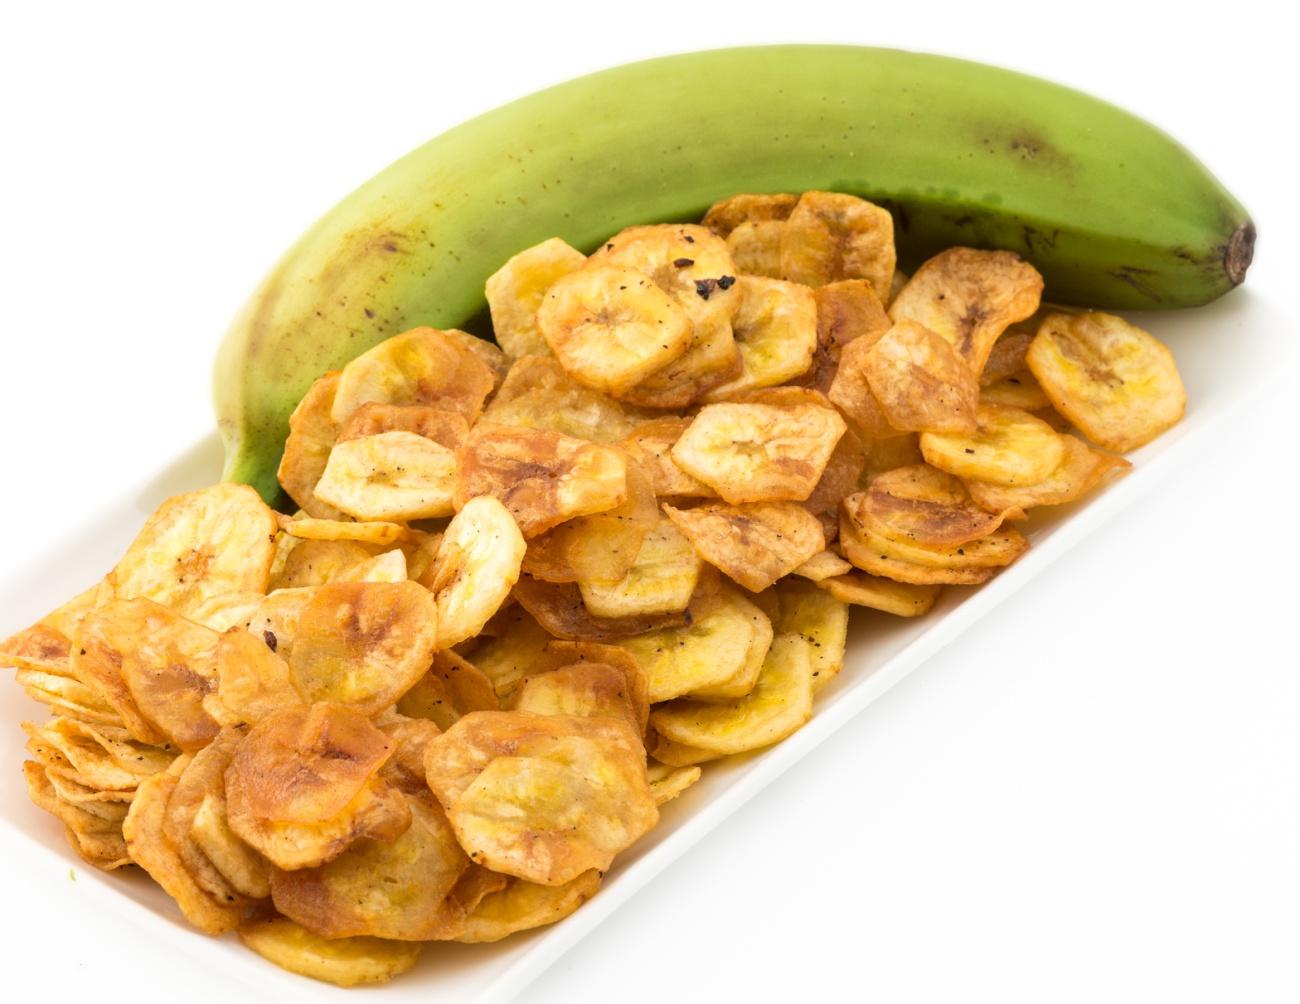 Green Banana Chips from Cuban Cuisine